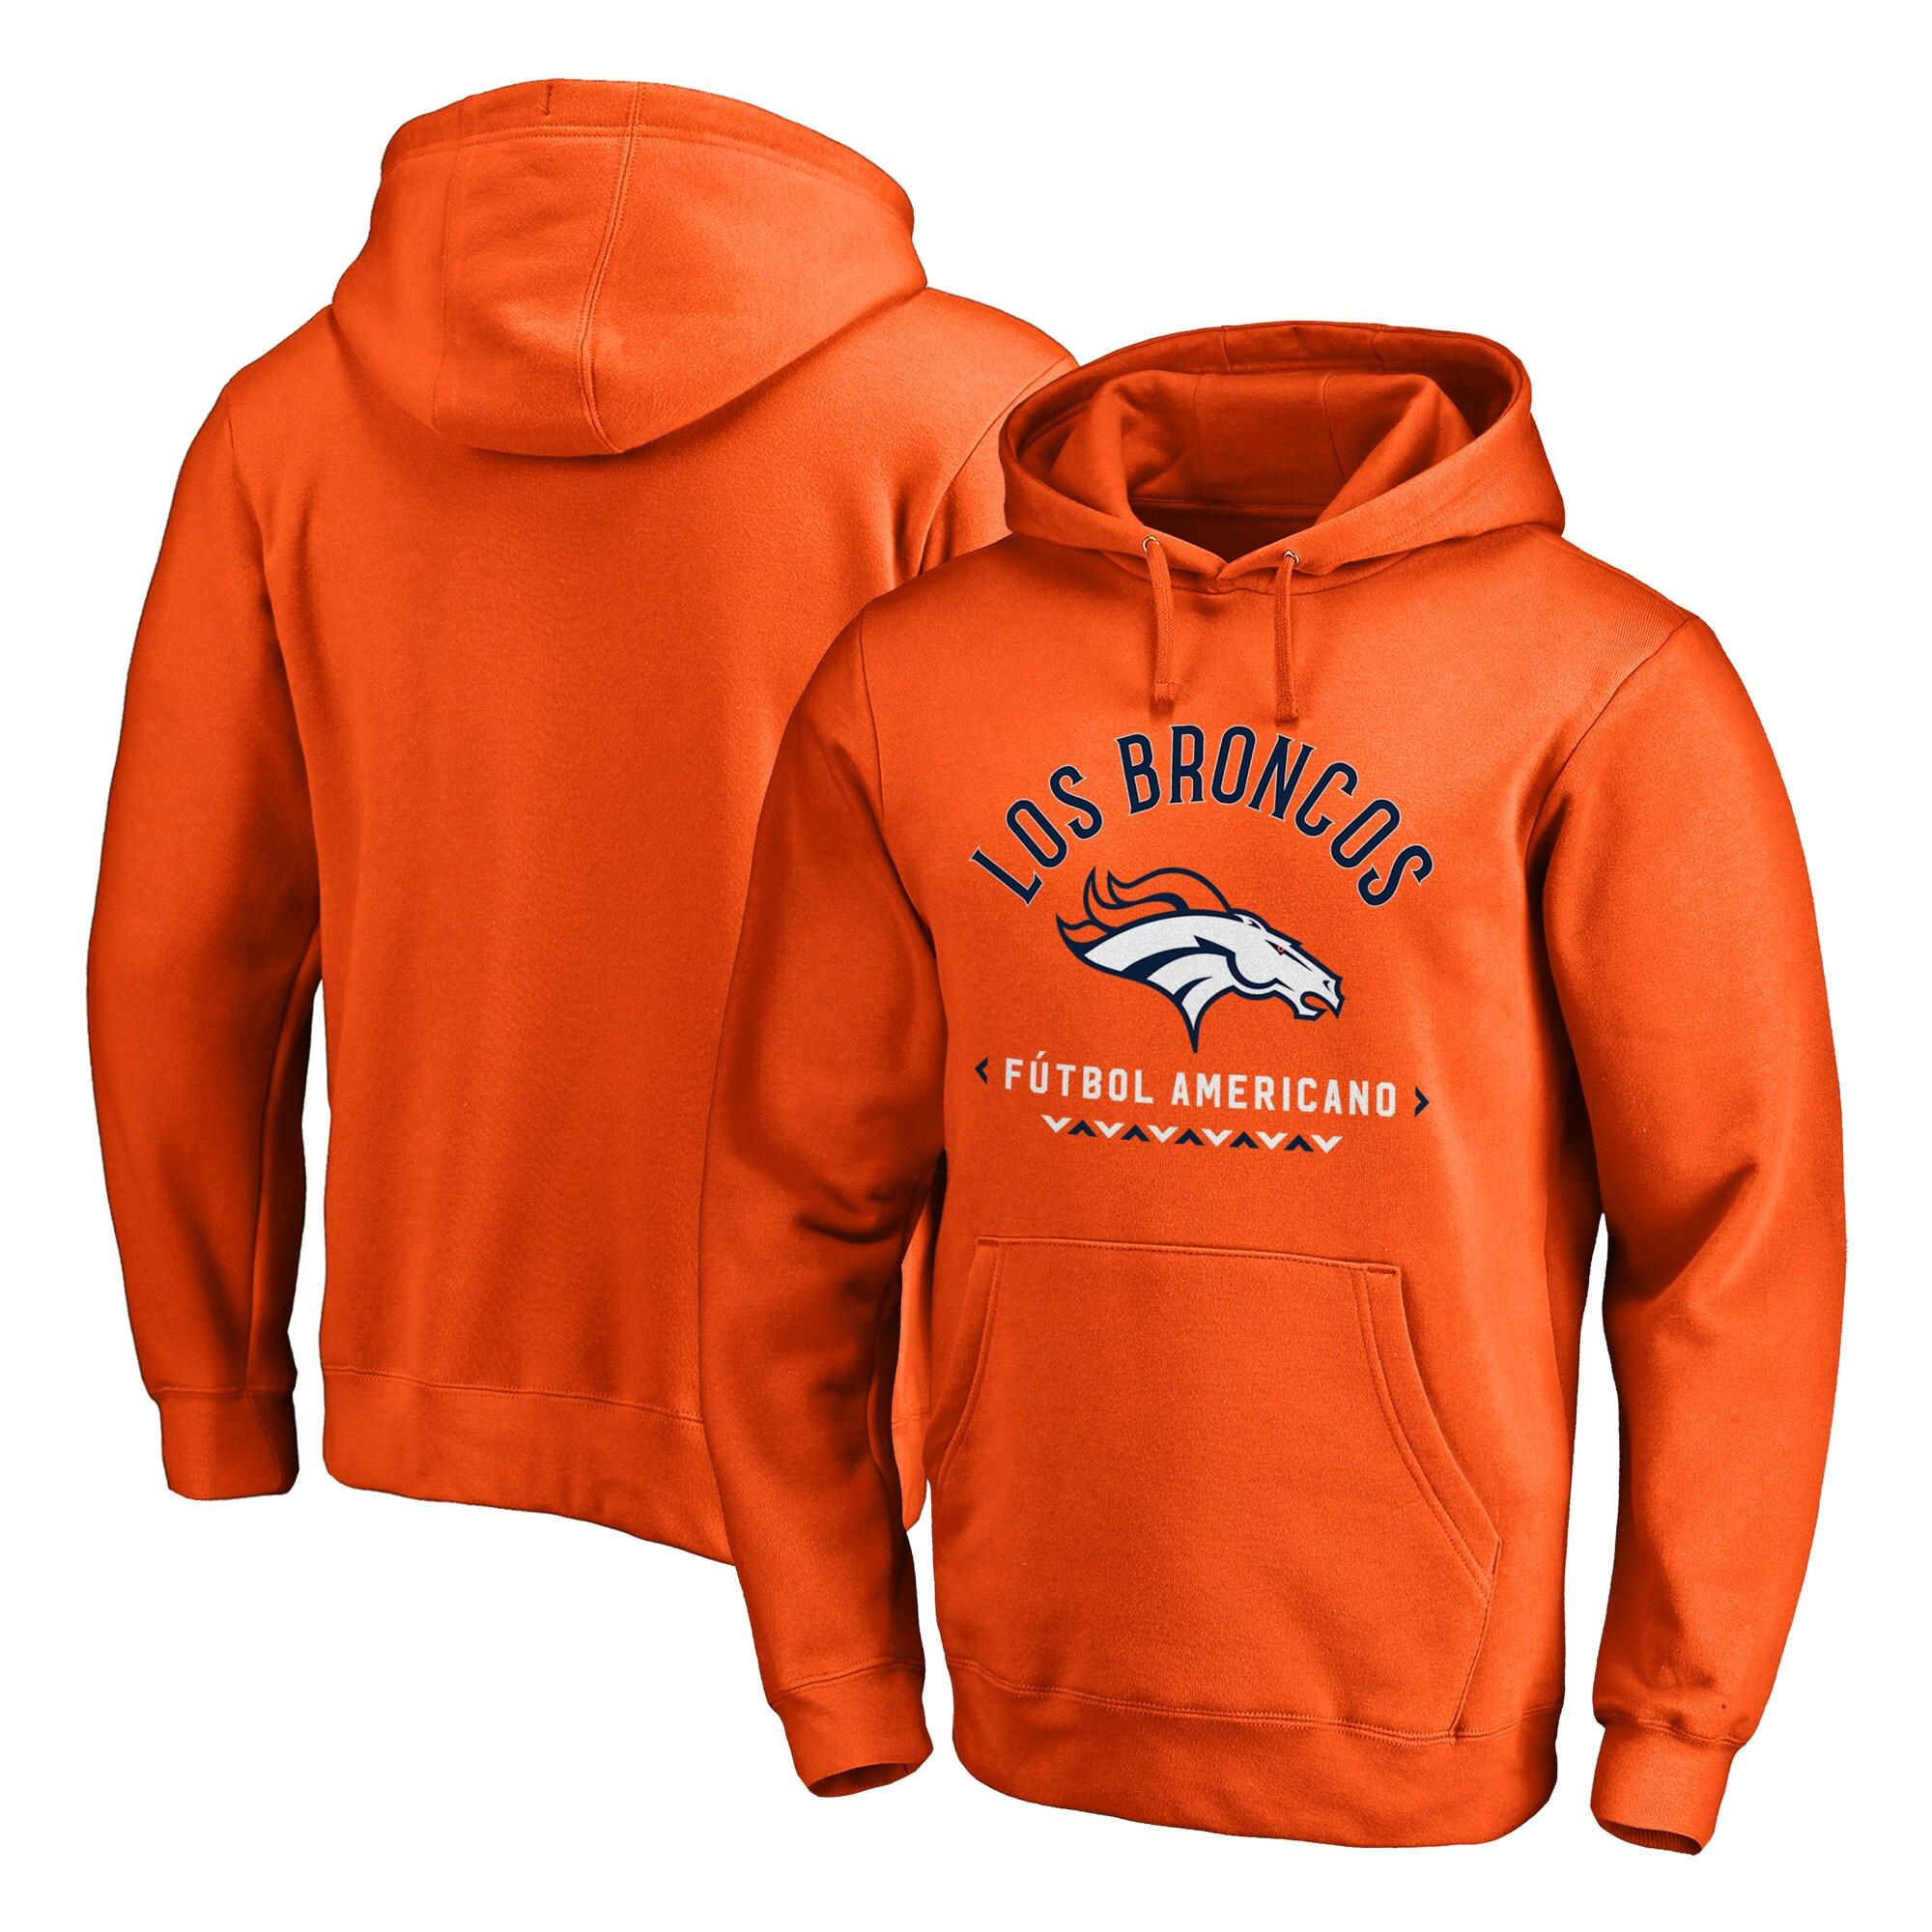 Denver Broncos NFL Pro Line by Fanatics Branded Futbol Americano Pullover Hoodie - Orange